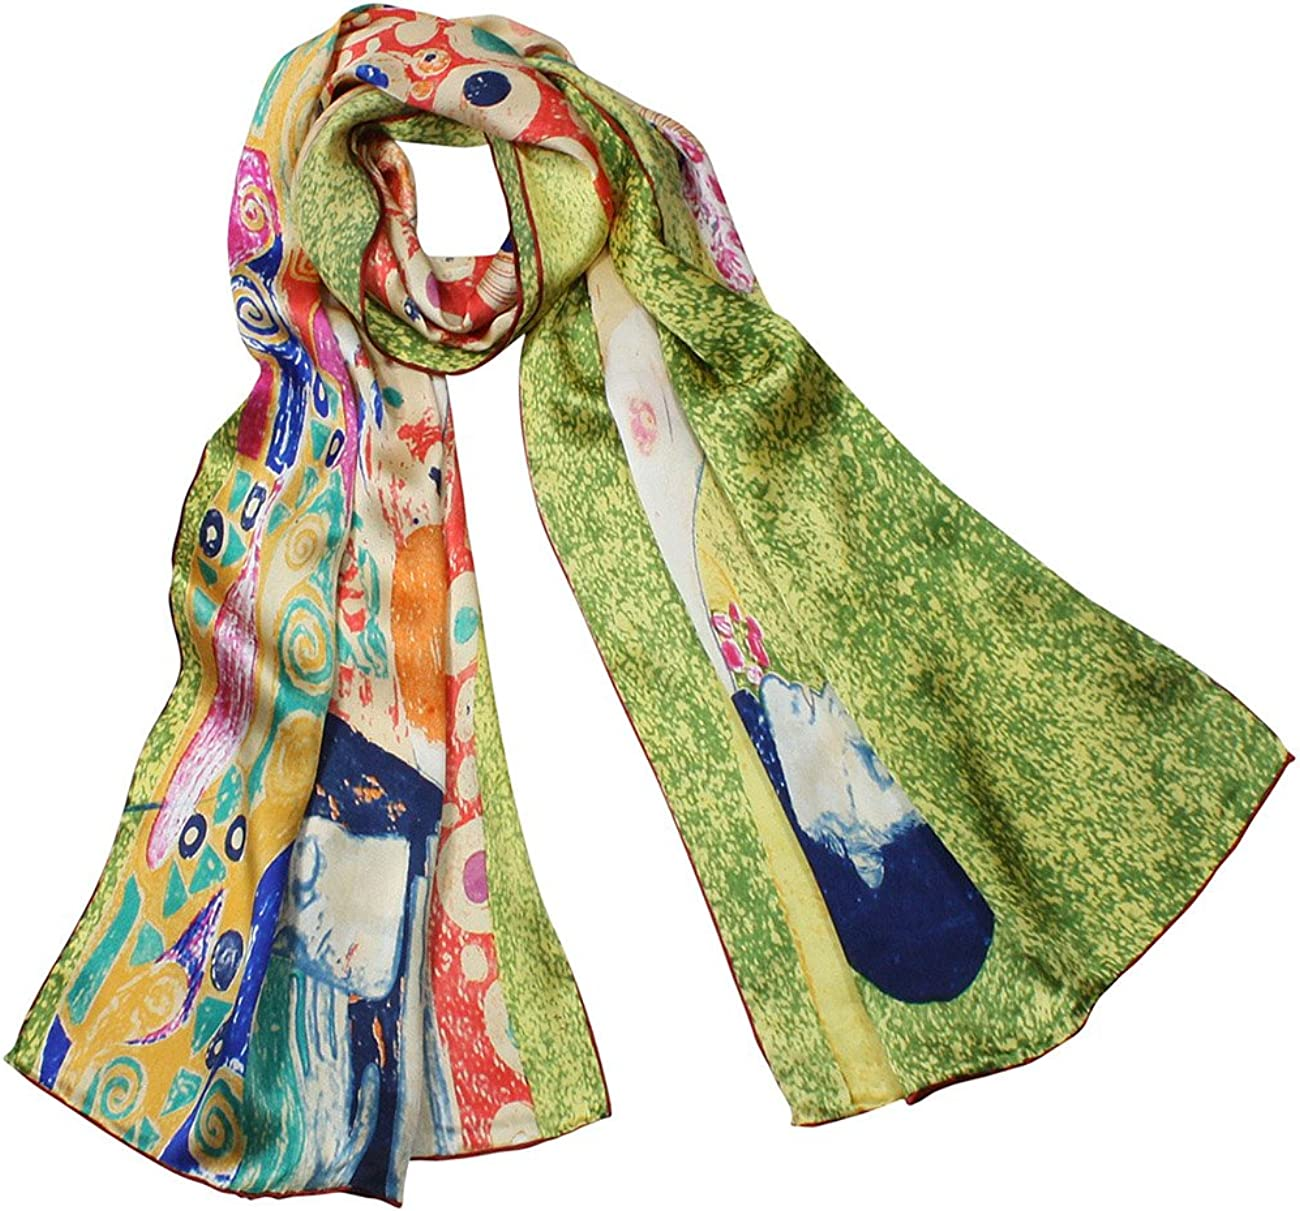 Dahlia Women's 100% Luxury Silk Scarf - Gustav Klimt's Famous Painting